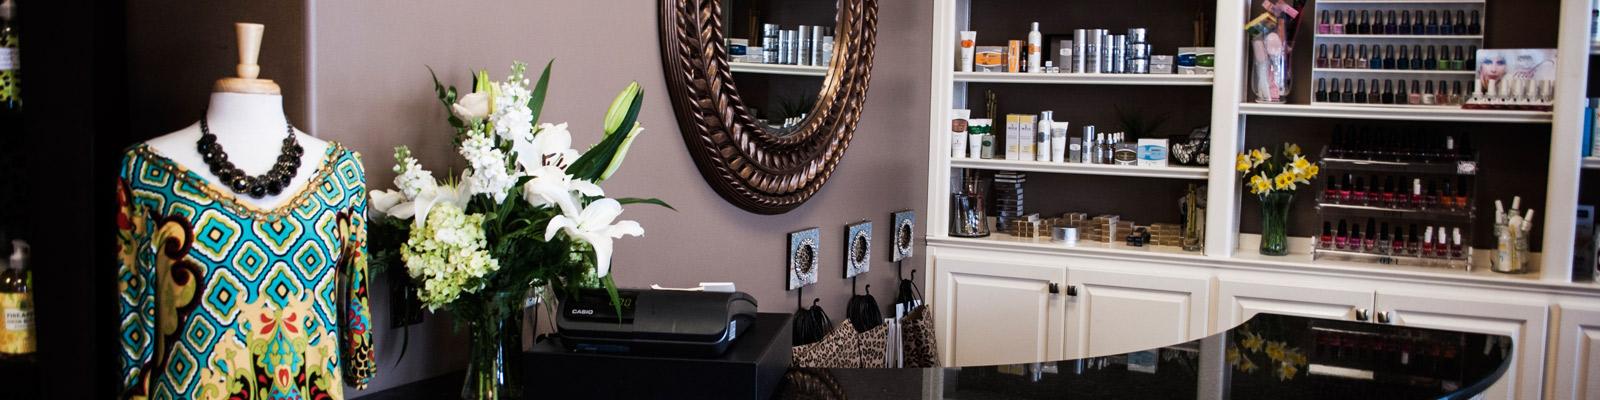 nail-boutique-salon-staff